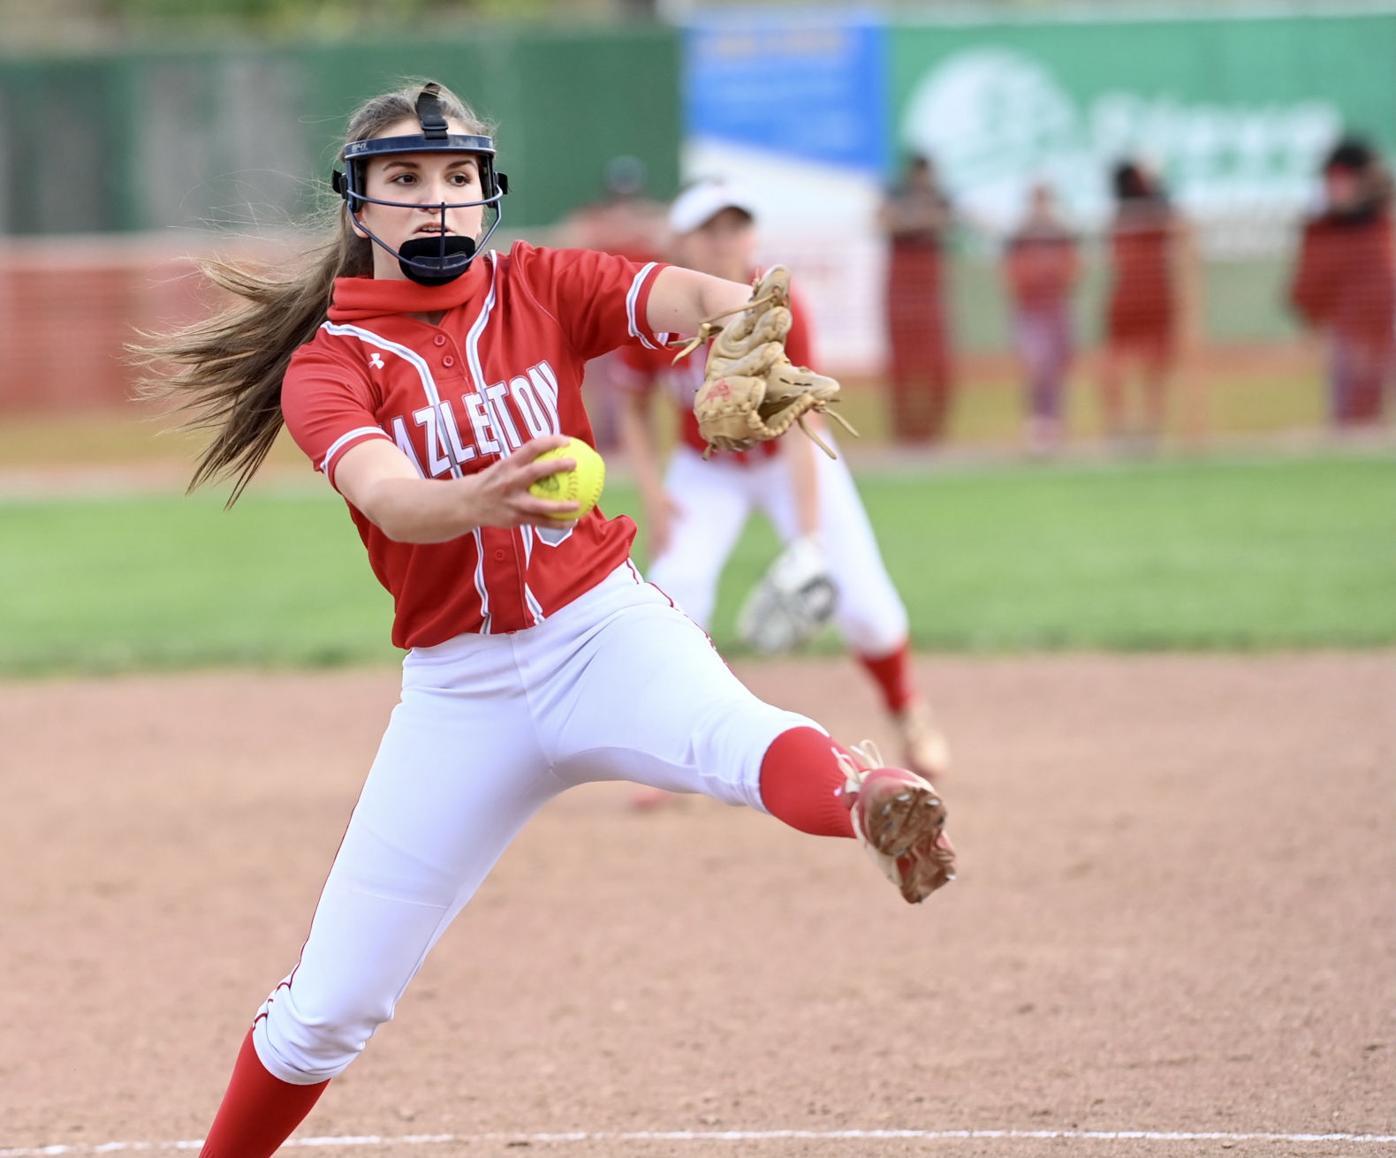 Lady Cougars claim District 2/4 6A softball championship